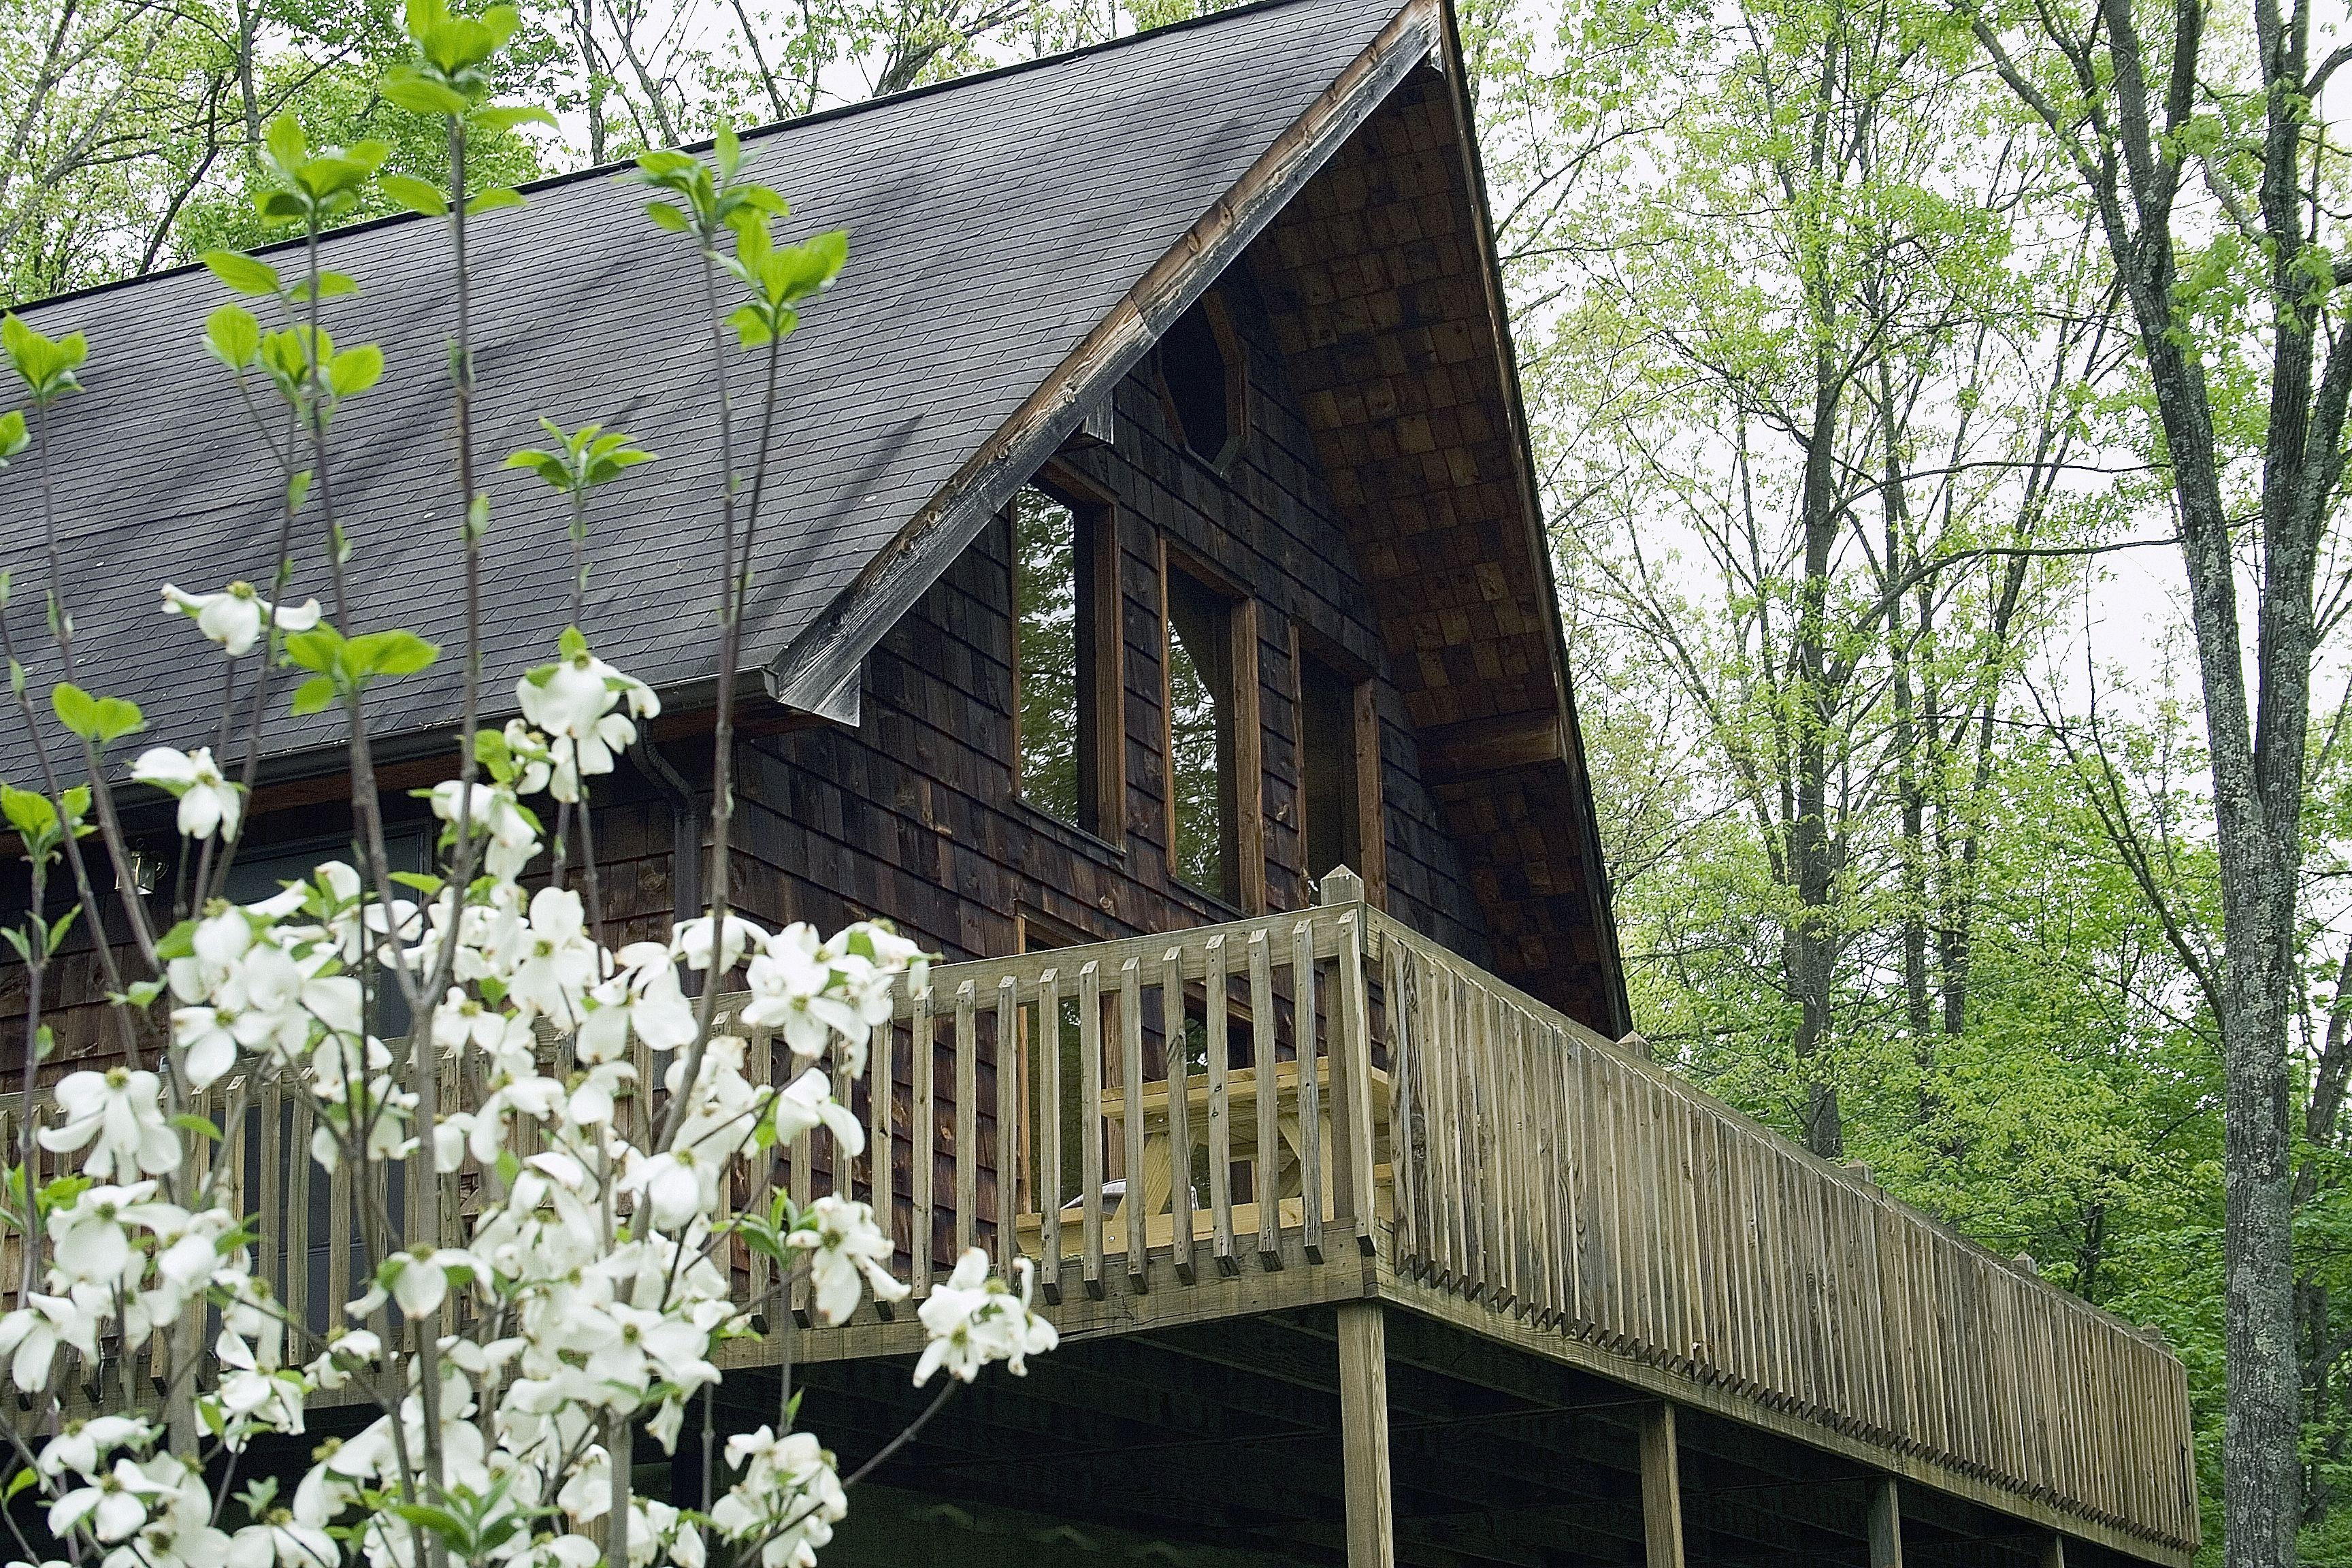 map resort park mtmbilab x parks oglebay com montgomery john regional cabins cabin exceptional